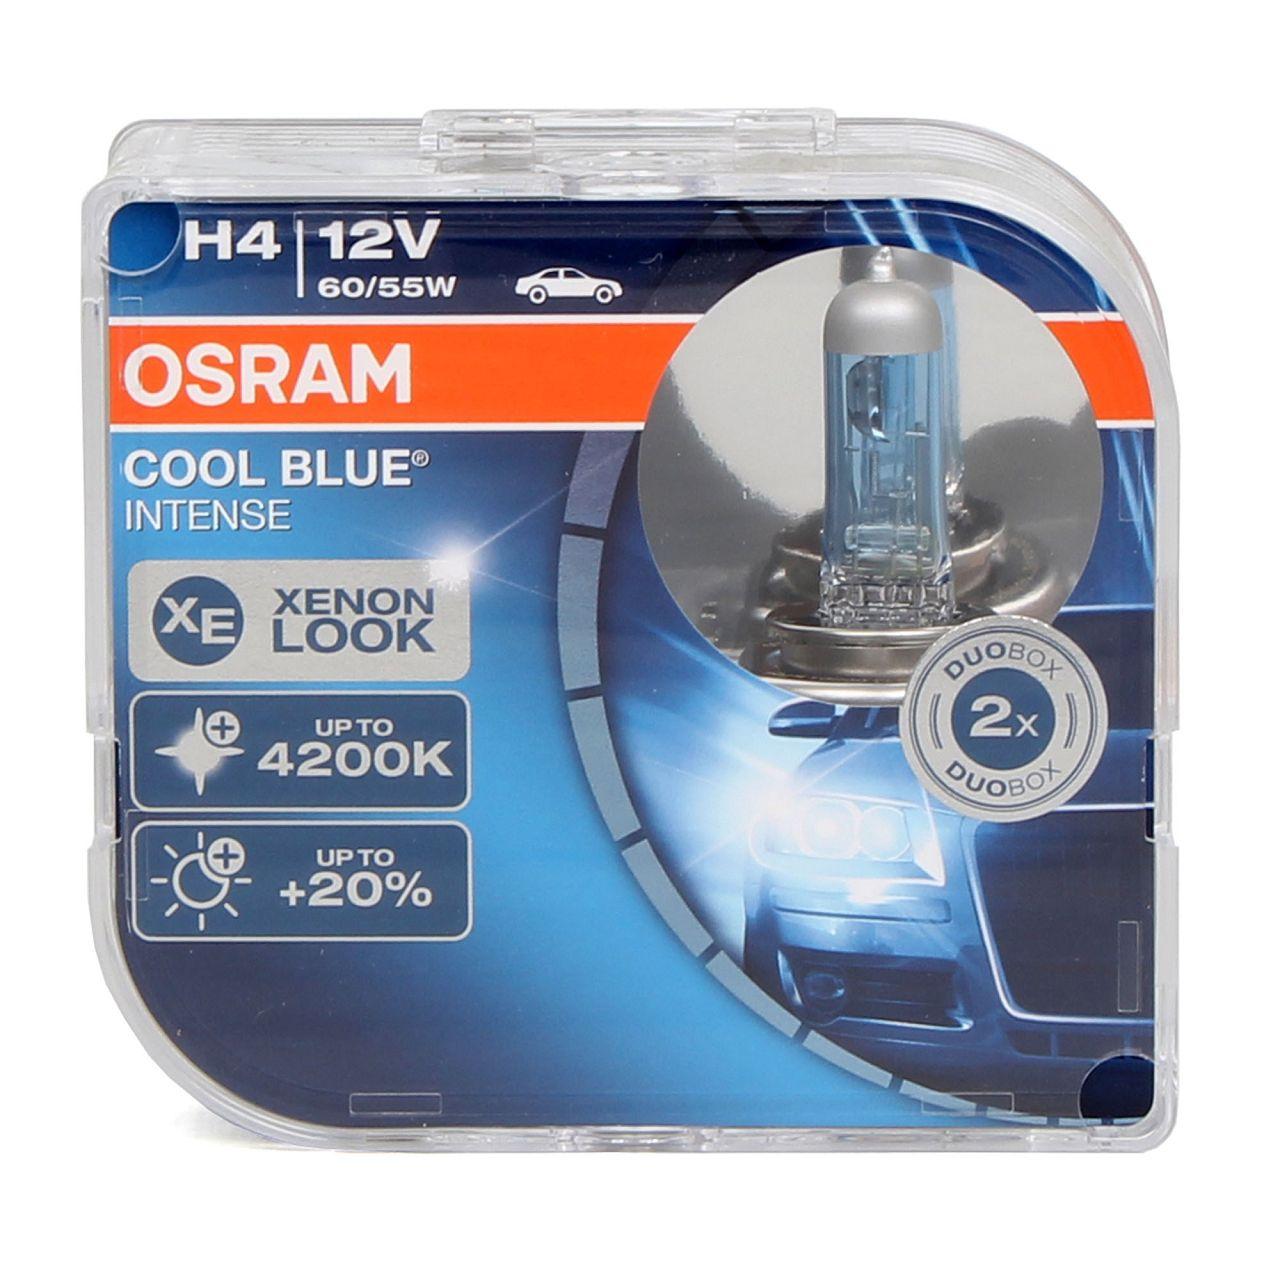 2x OSRAM Halogenlampe H4 COOL BLUE INTENSE CBI 12V 60 / 55W P43t 64193CBI-HCB